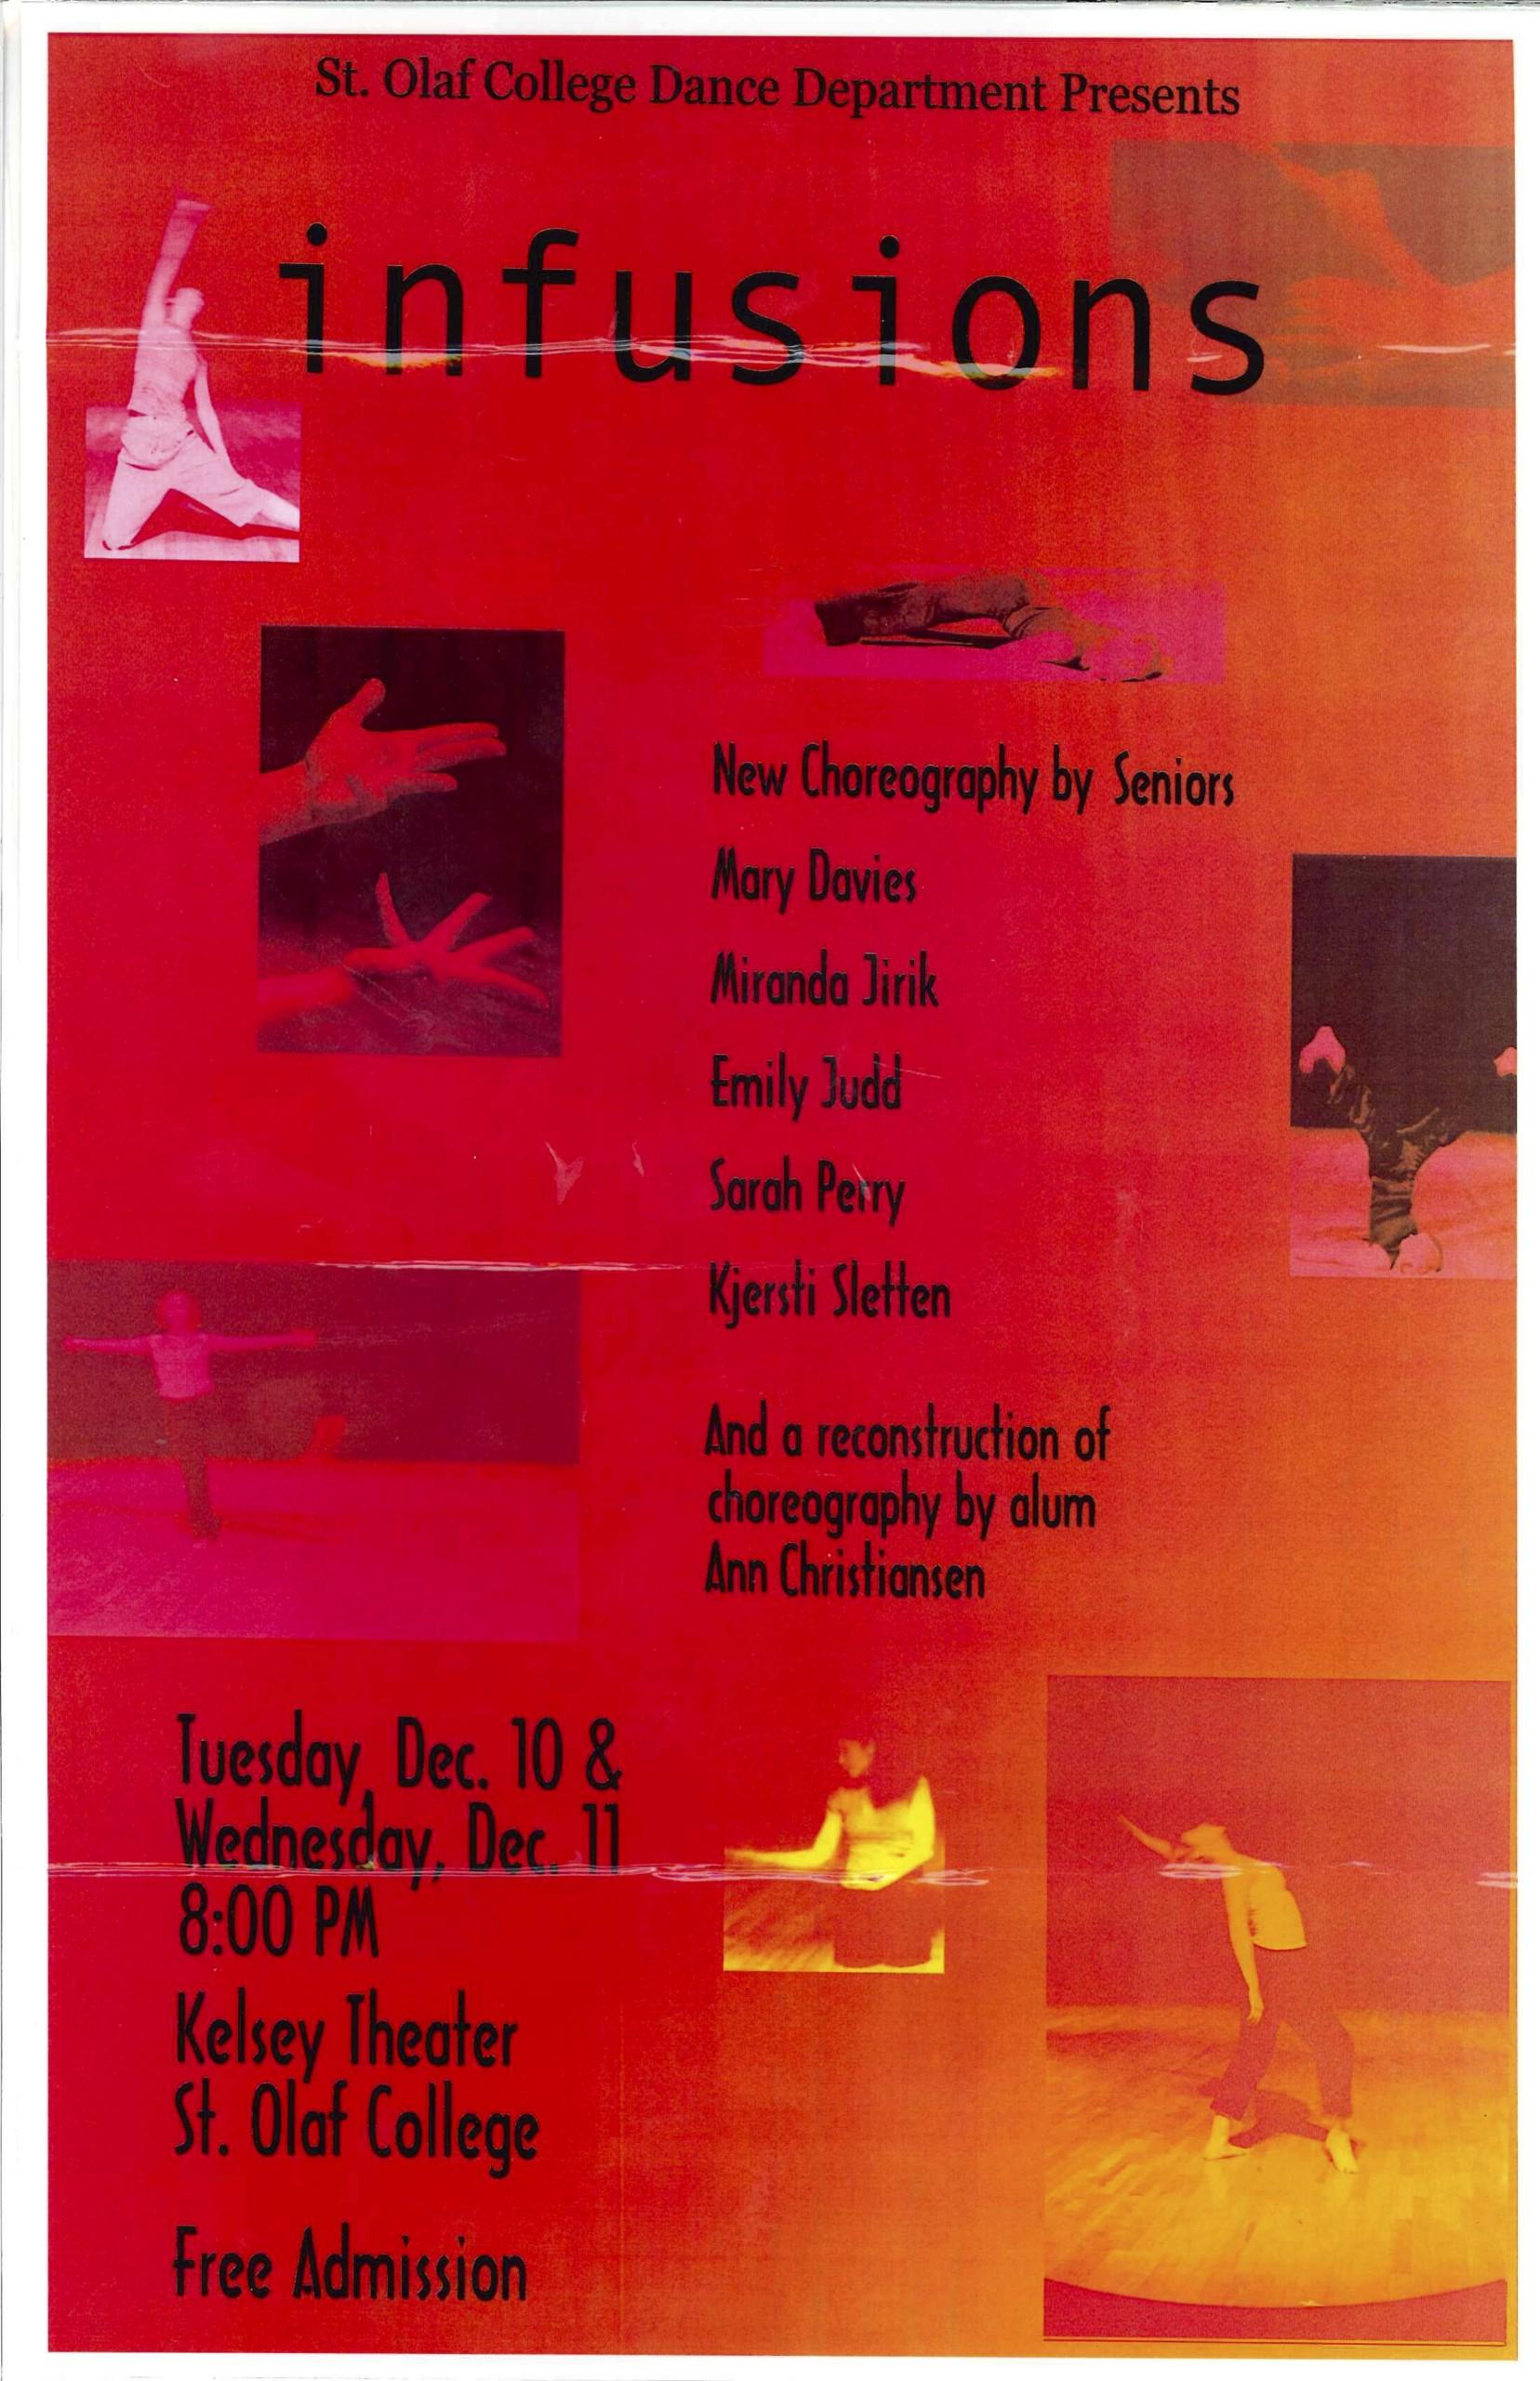 2002-03_dance_sdc_poster-min